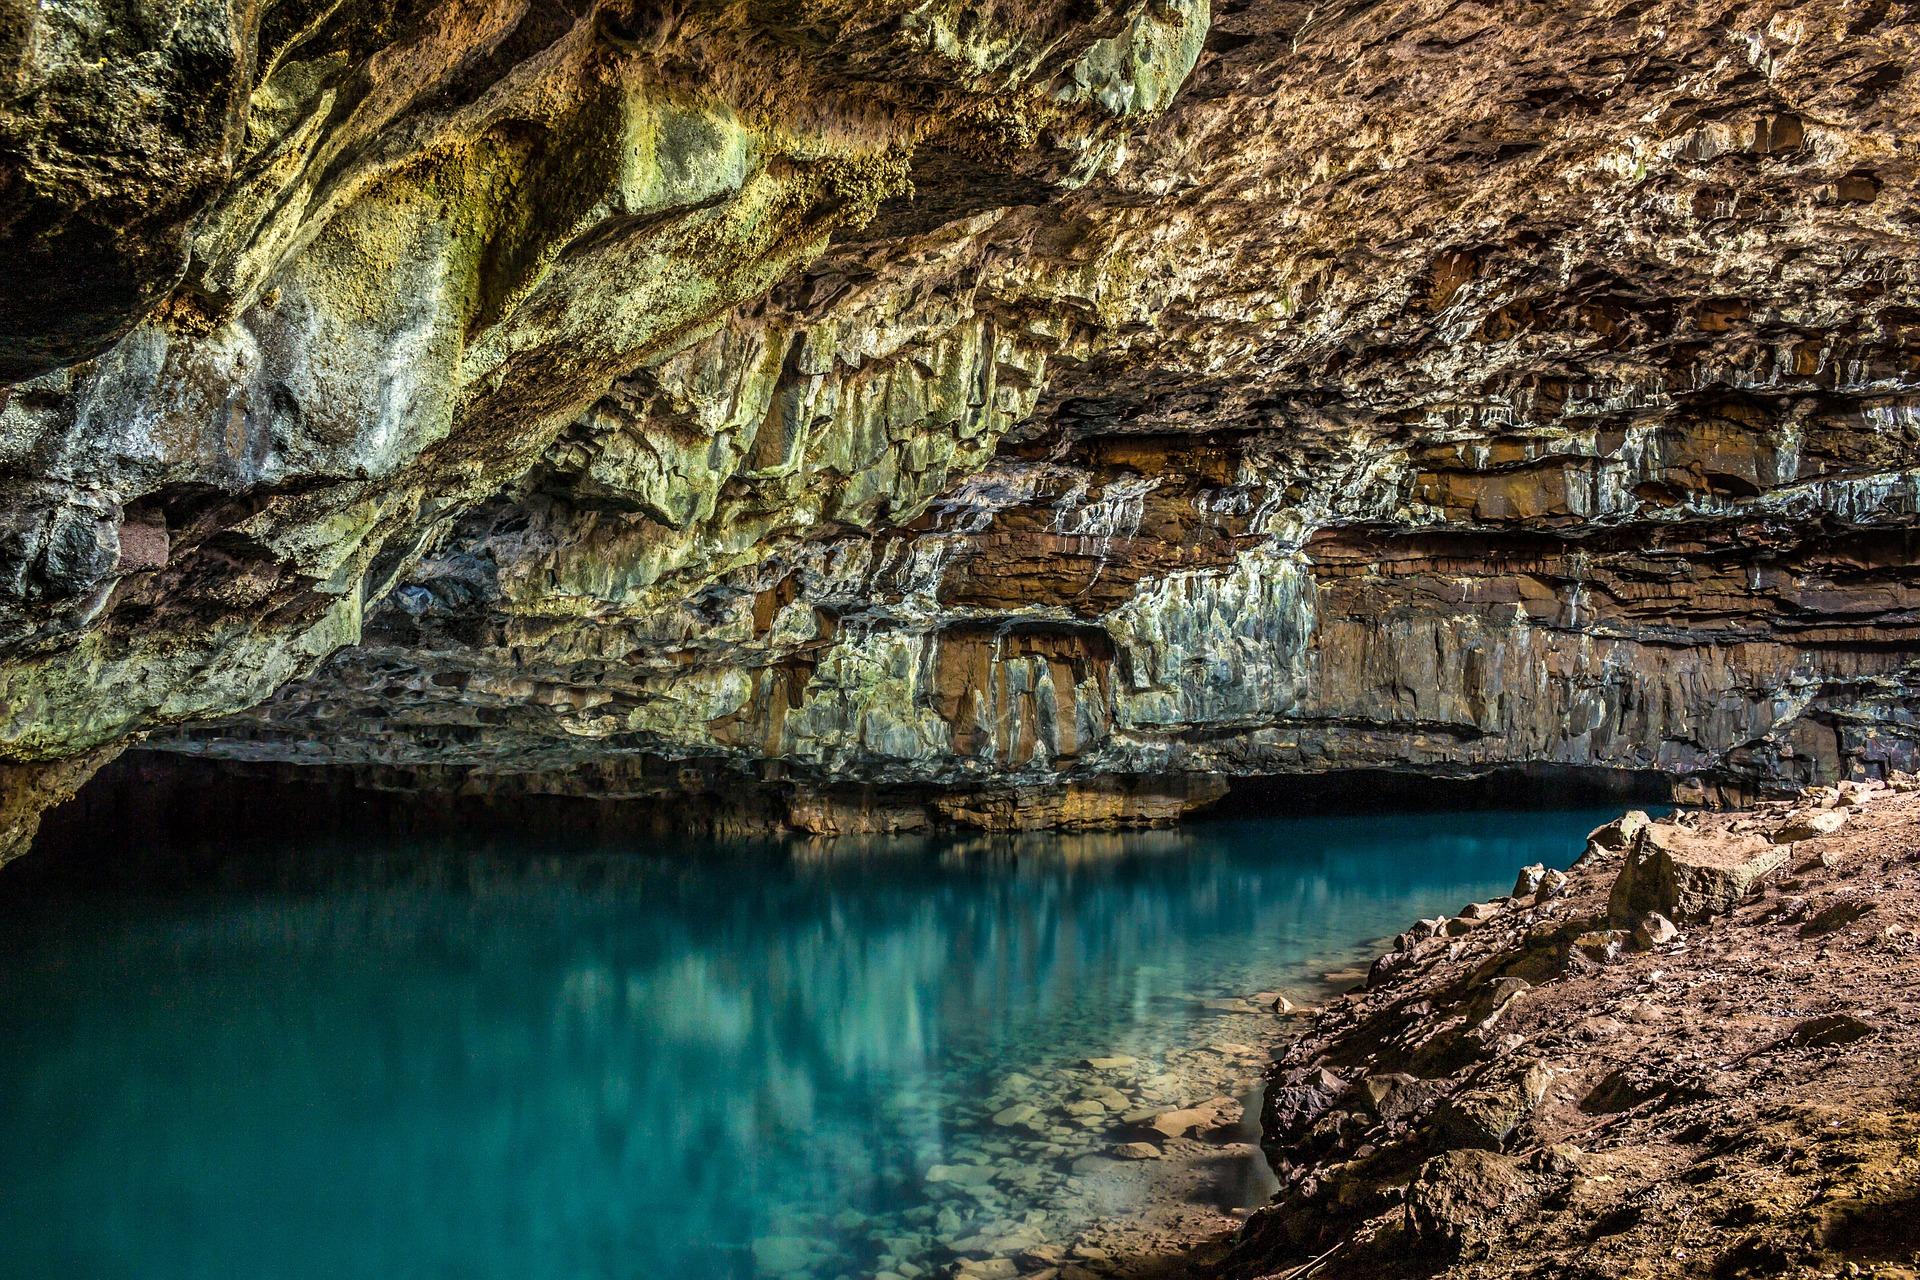 Caves_3dmellon